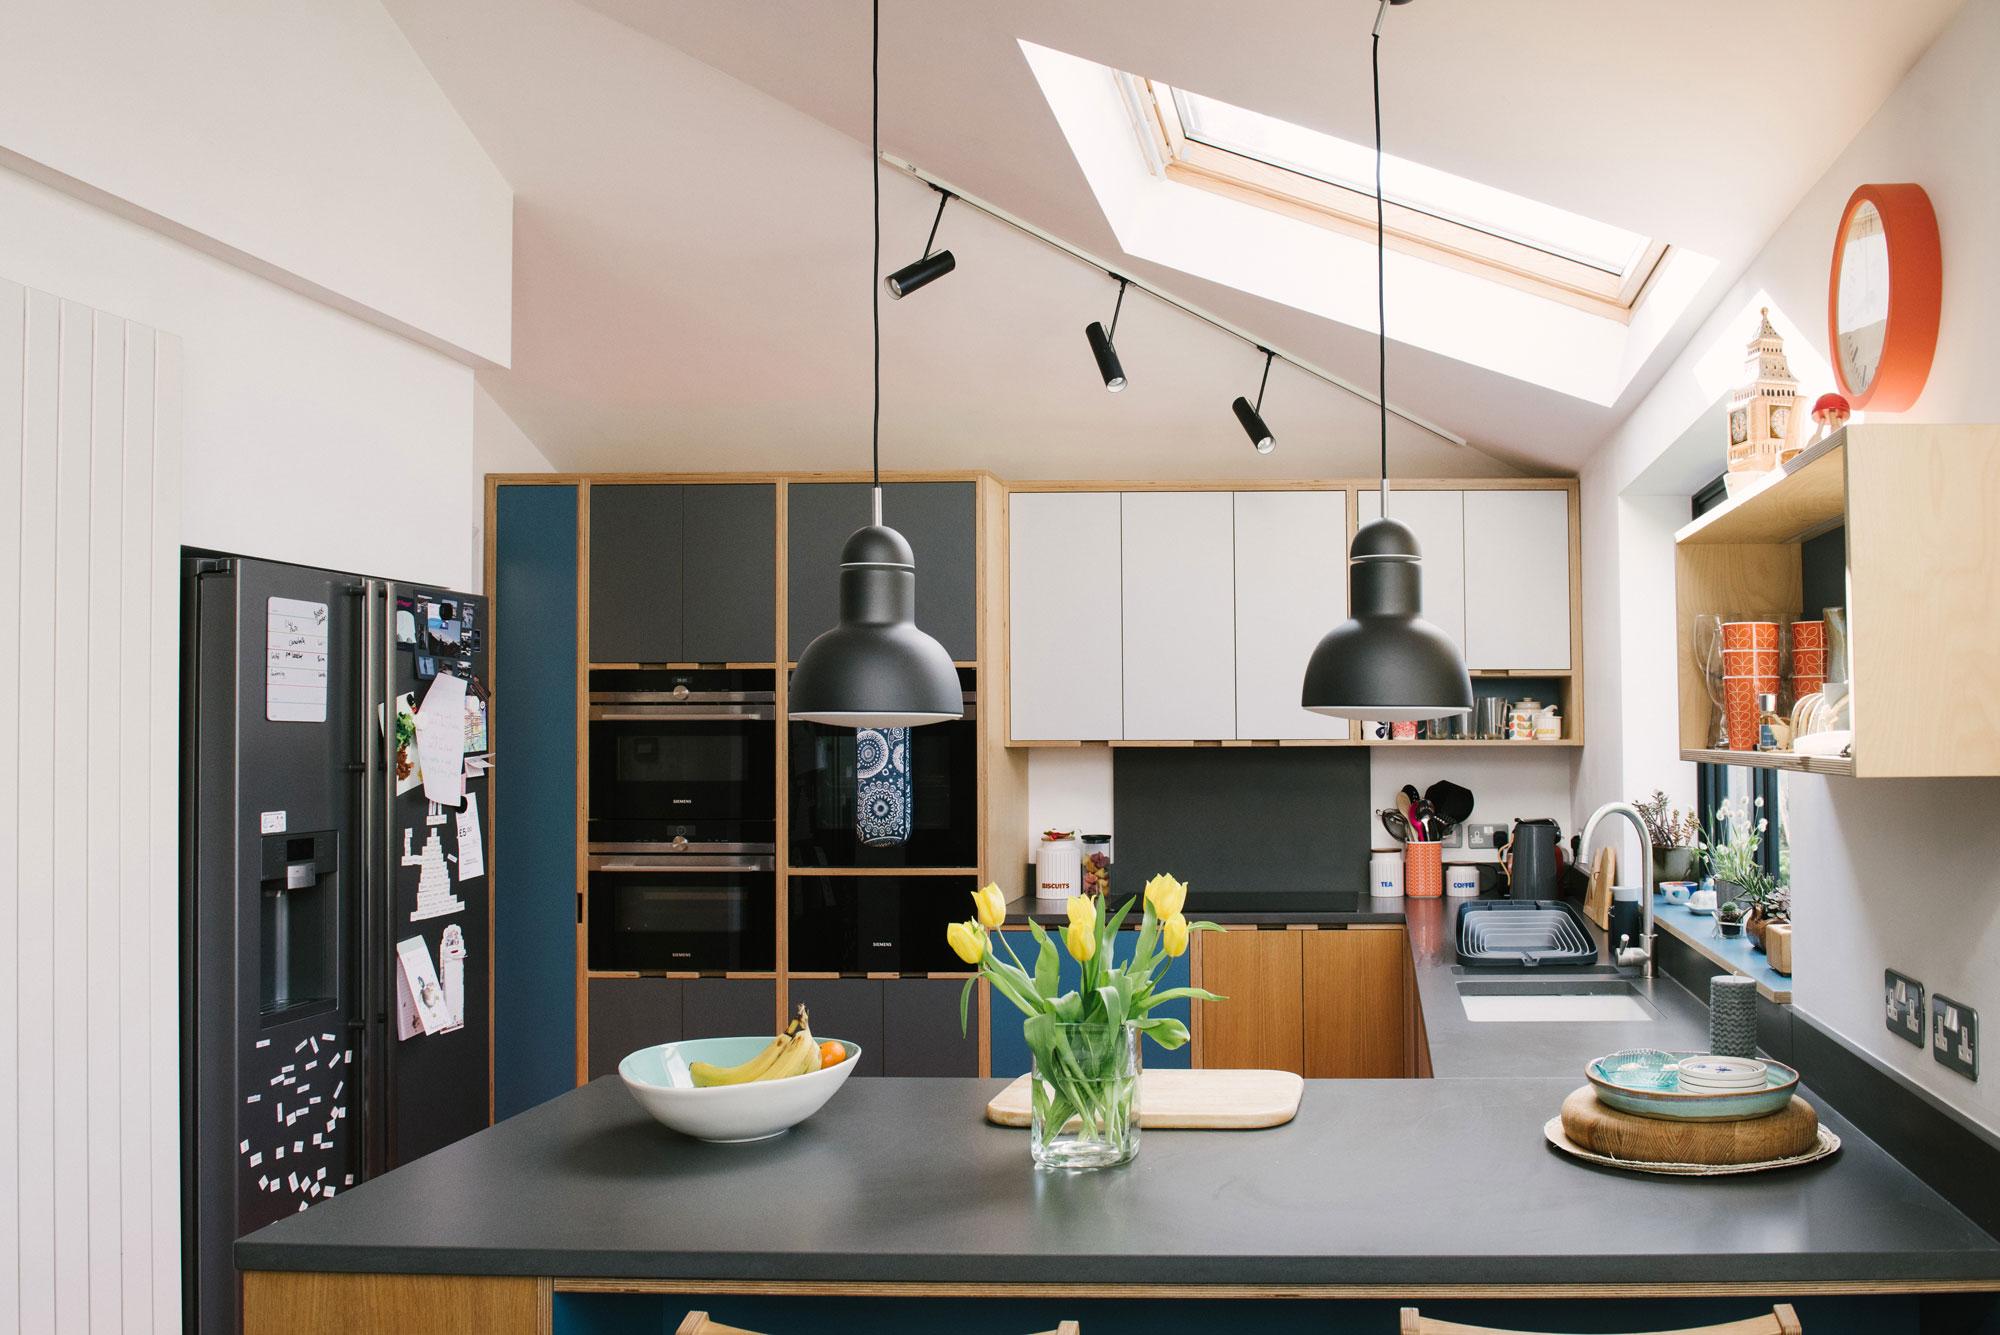 Fridge area of Plywood Kitchen With Orange Floor